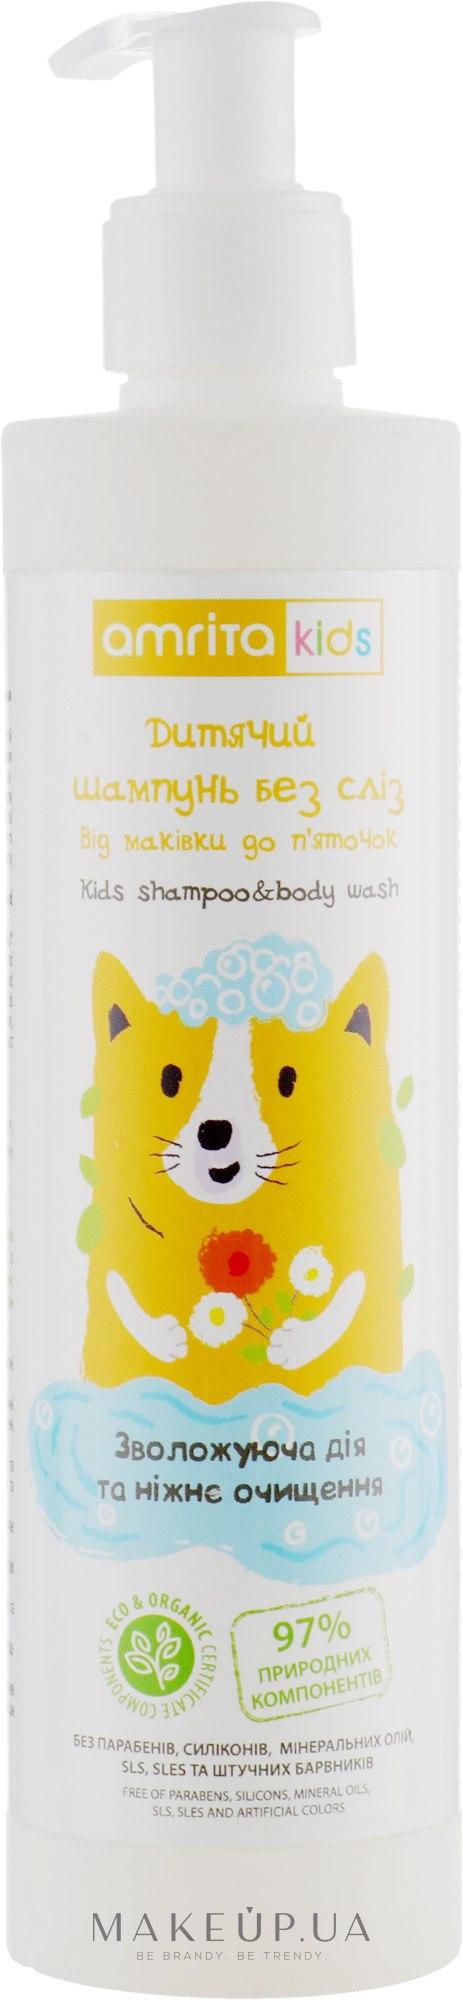 "Детский шампунь без слез ""От макушки до пяточек"" - Amrita Kids Shampoo & Body Wash — фото 250ml"